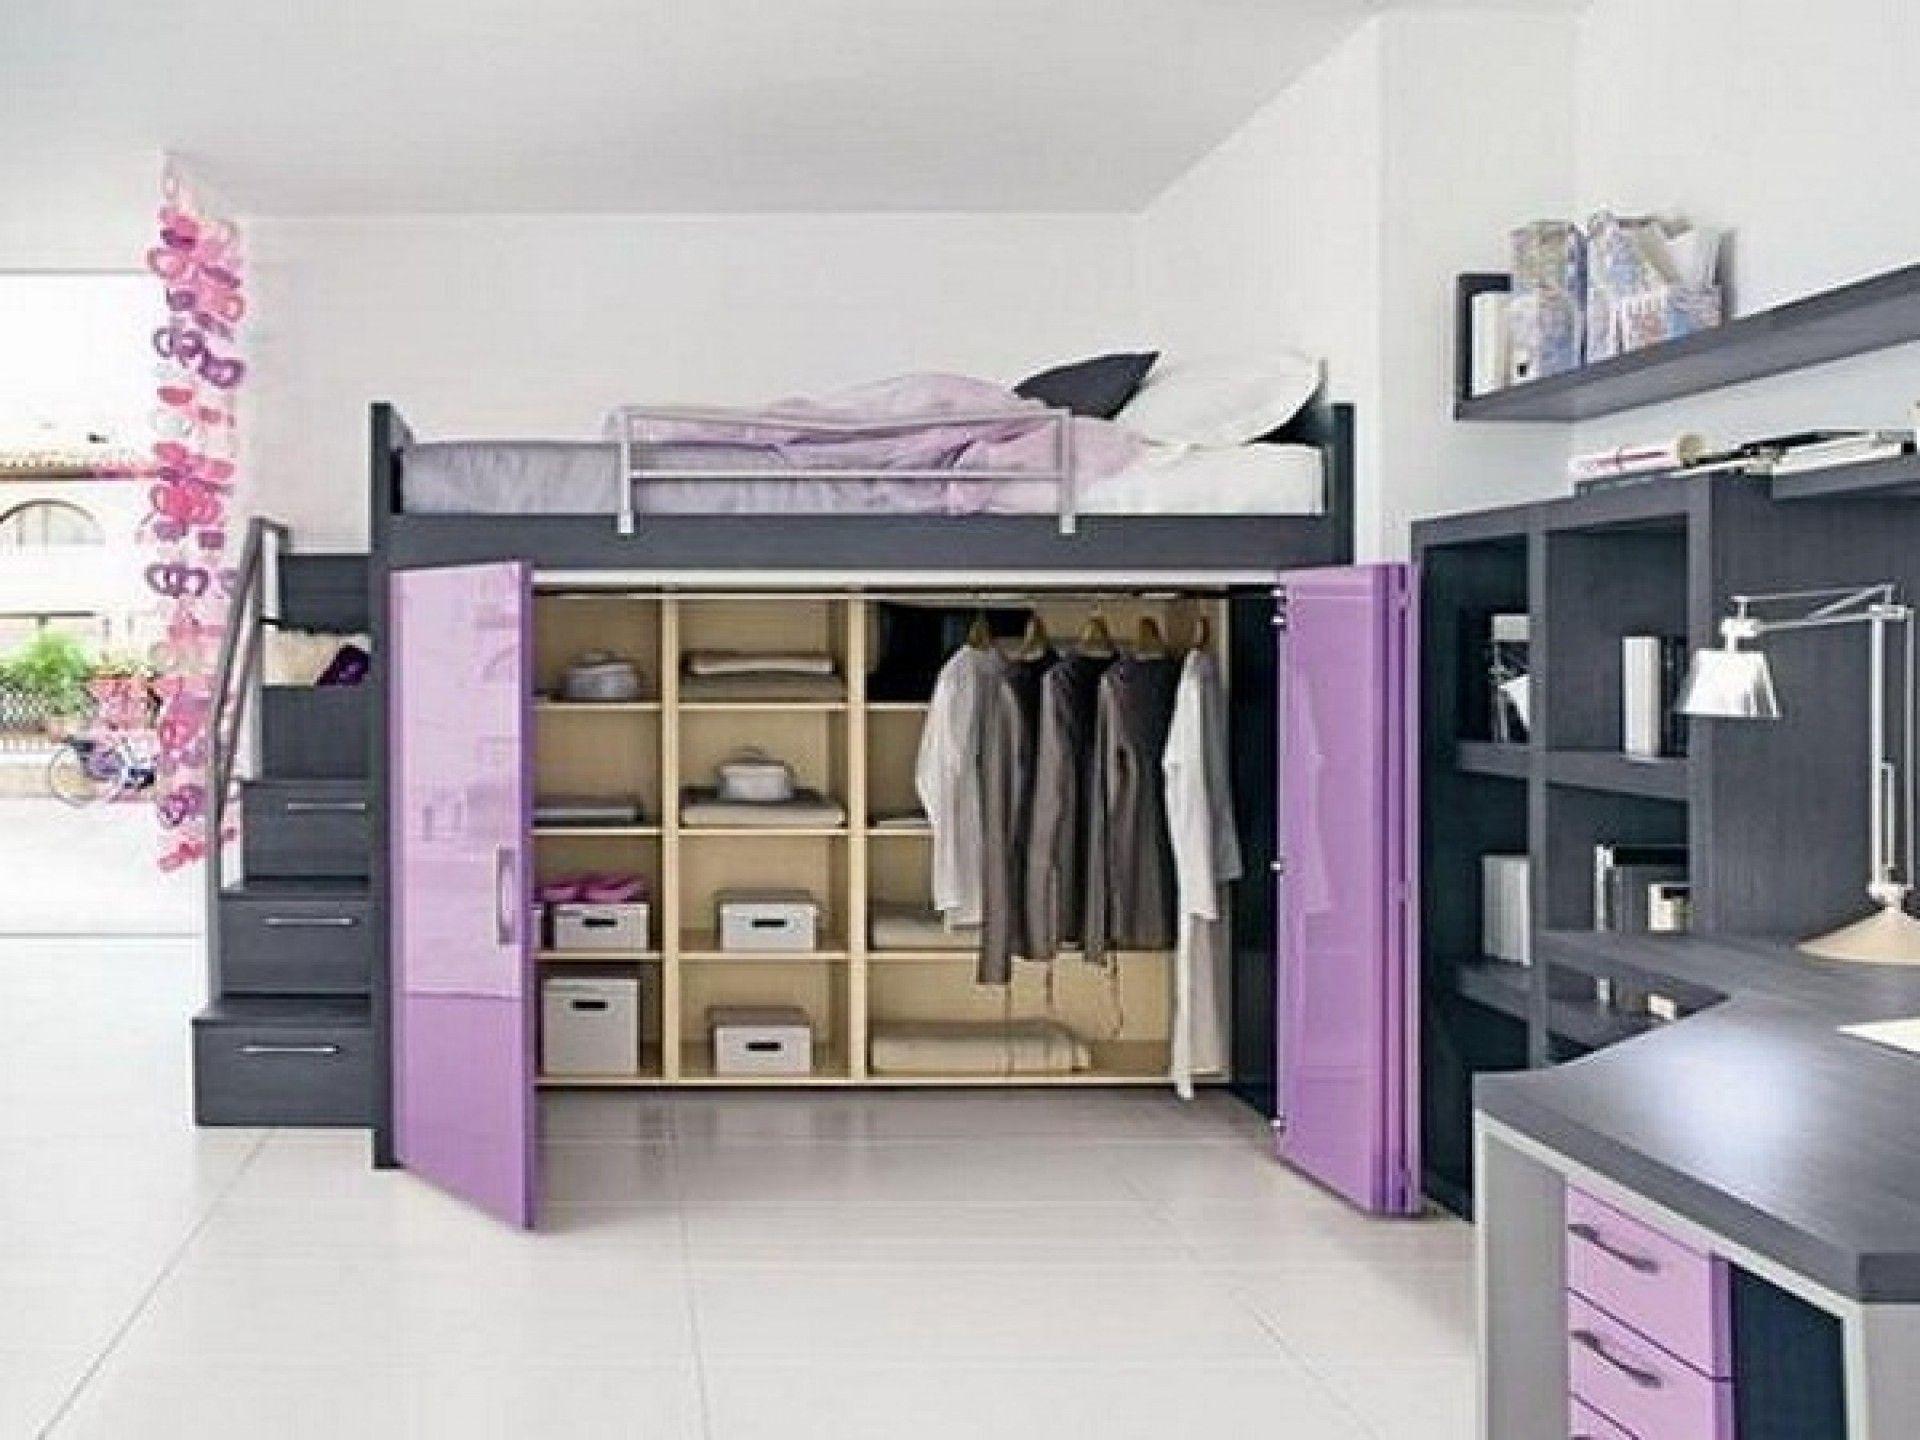 Creative loft bed ideas  cama com guarda roupa embaixo  Pesquisa Google  Closets